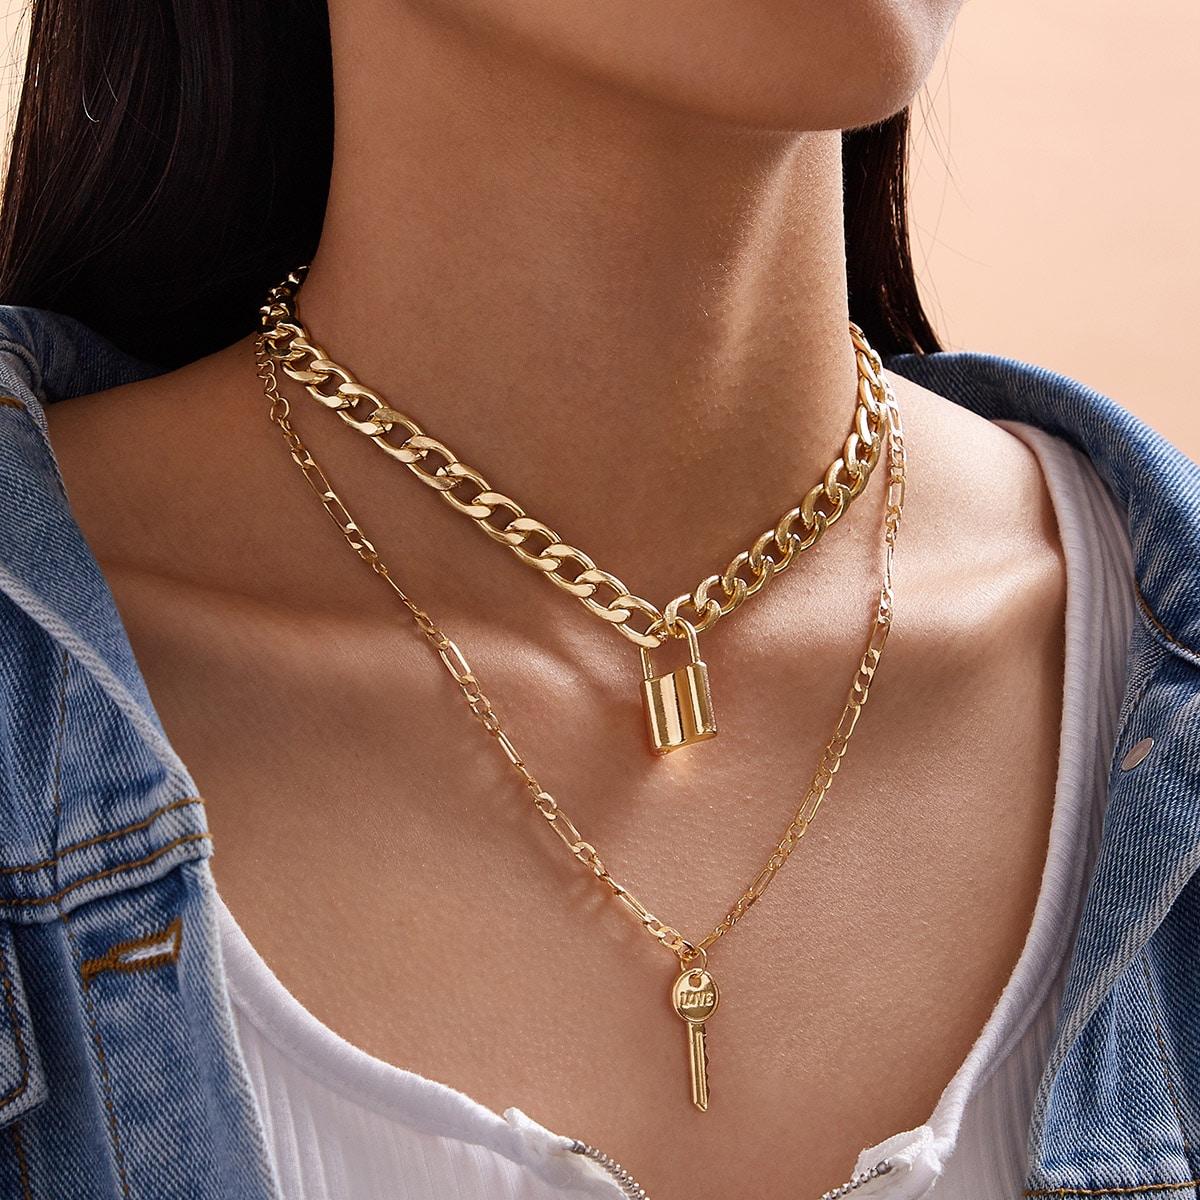 2pcs Lock & Key Charm Chain Necklace